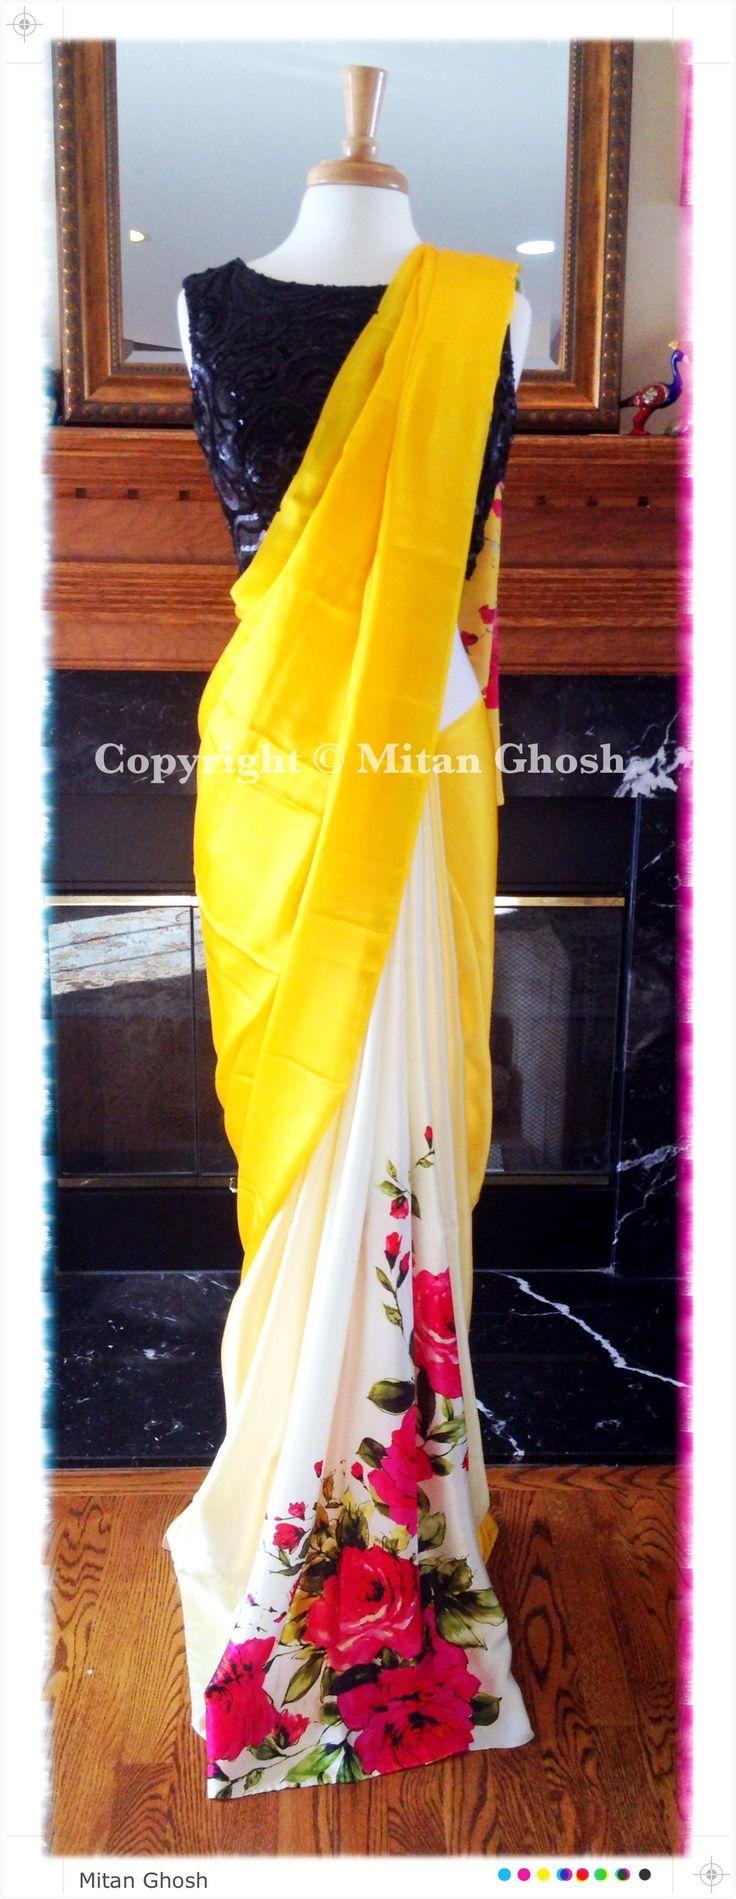 Mitan Ghosh White #Saree With Red Roses, Yellow Pallu Black #Blouse.